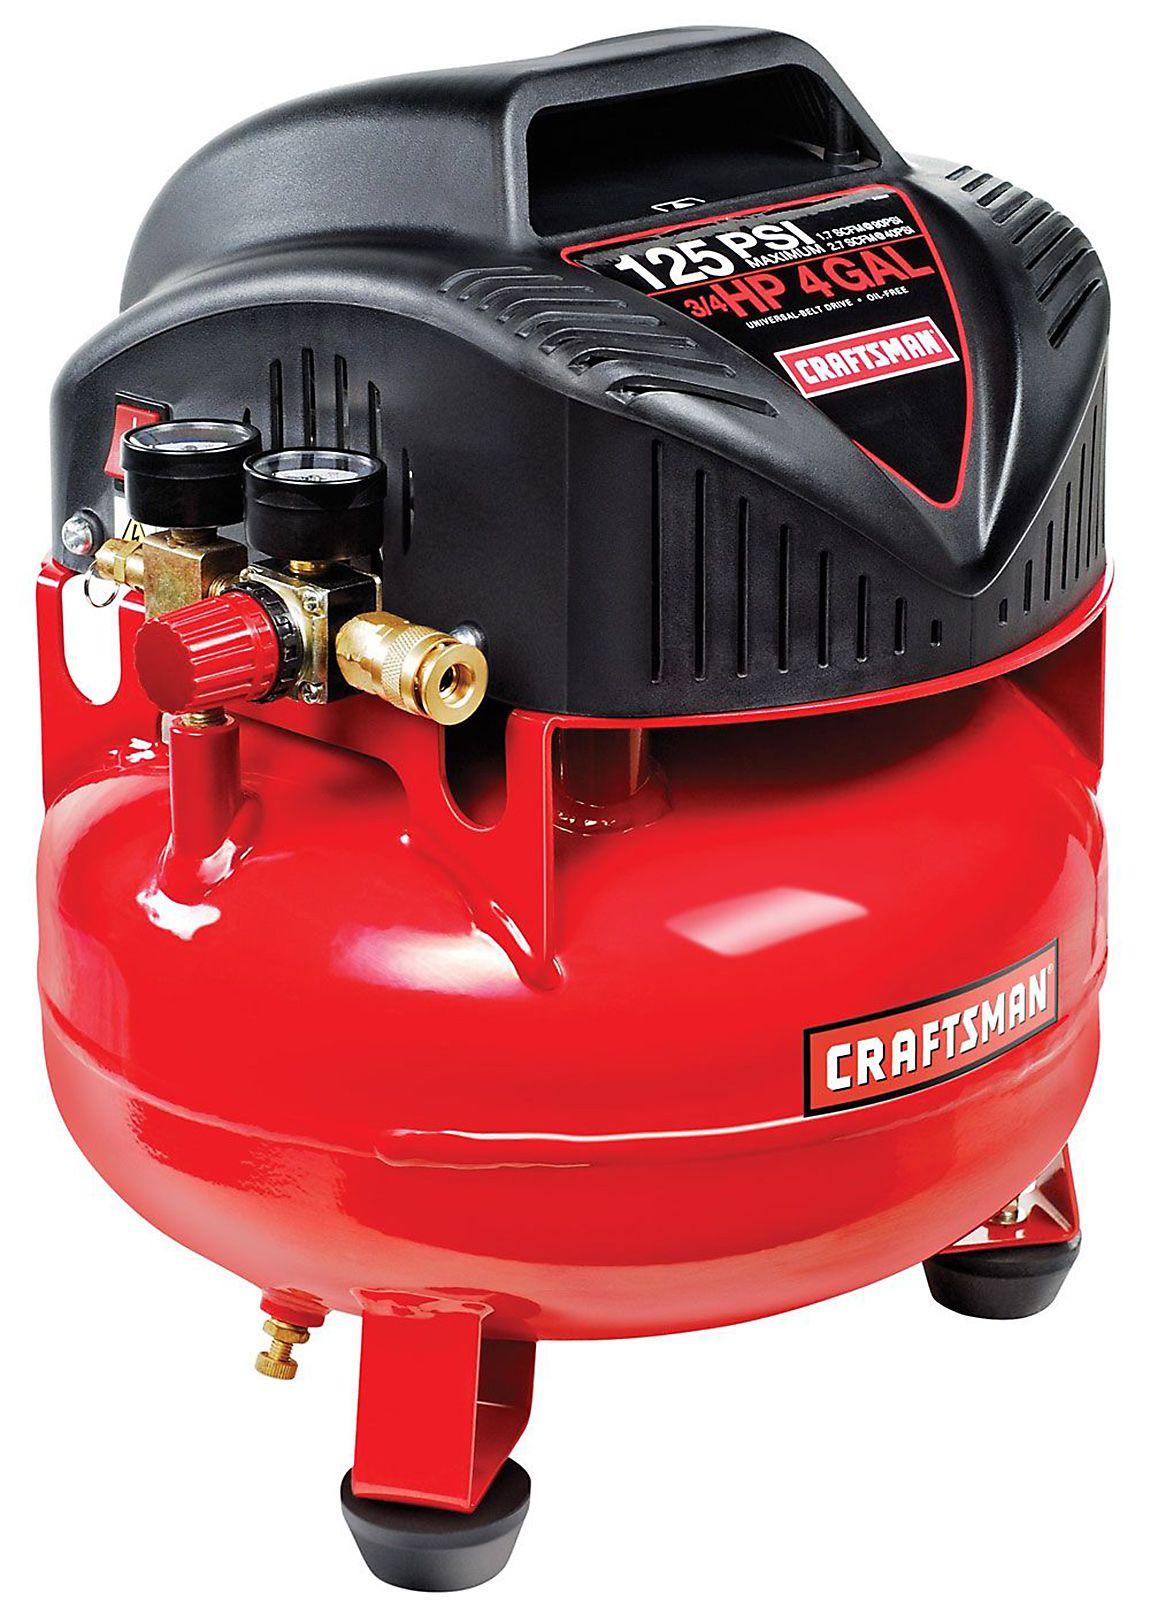 Craftsman 4 Gal Pancake Air Compressor Get Great Deals At Sears Pancake Air Compressor Craftsman Air Compressor Air Compressor